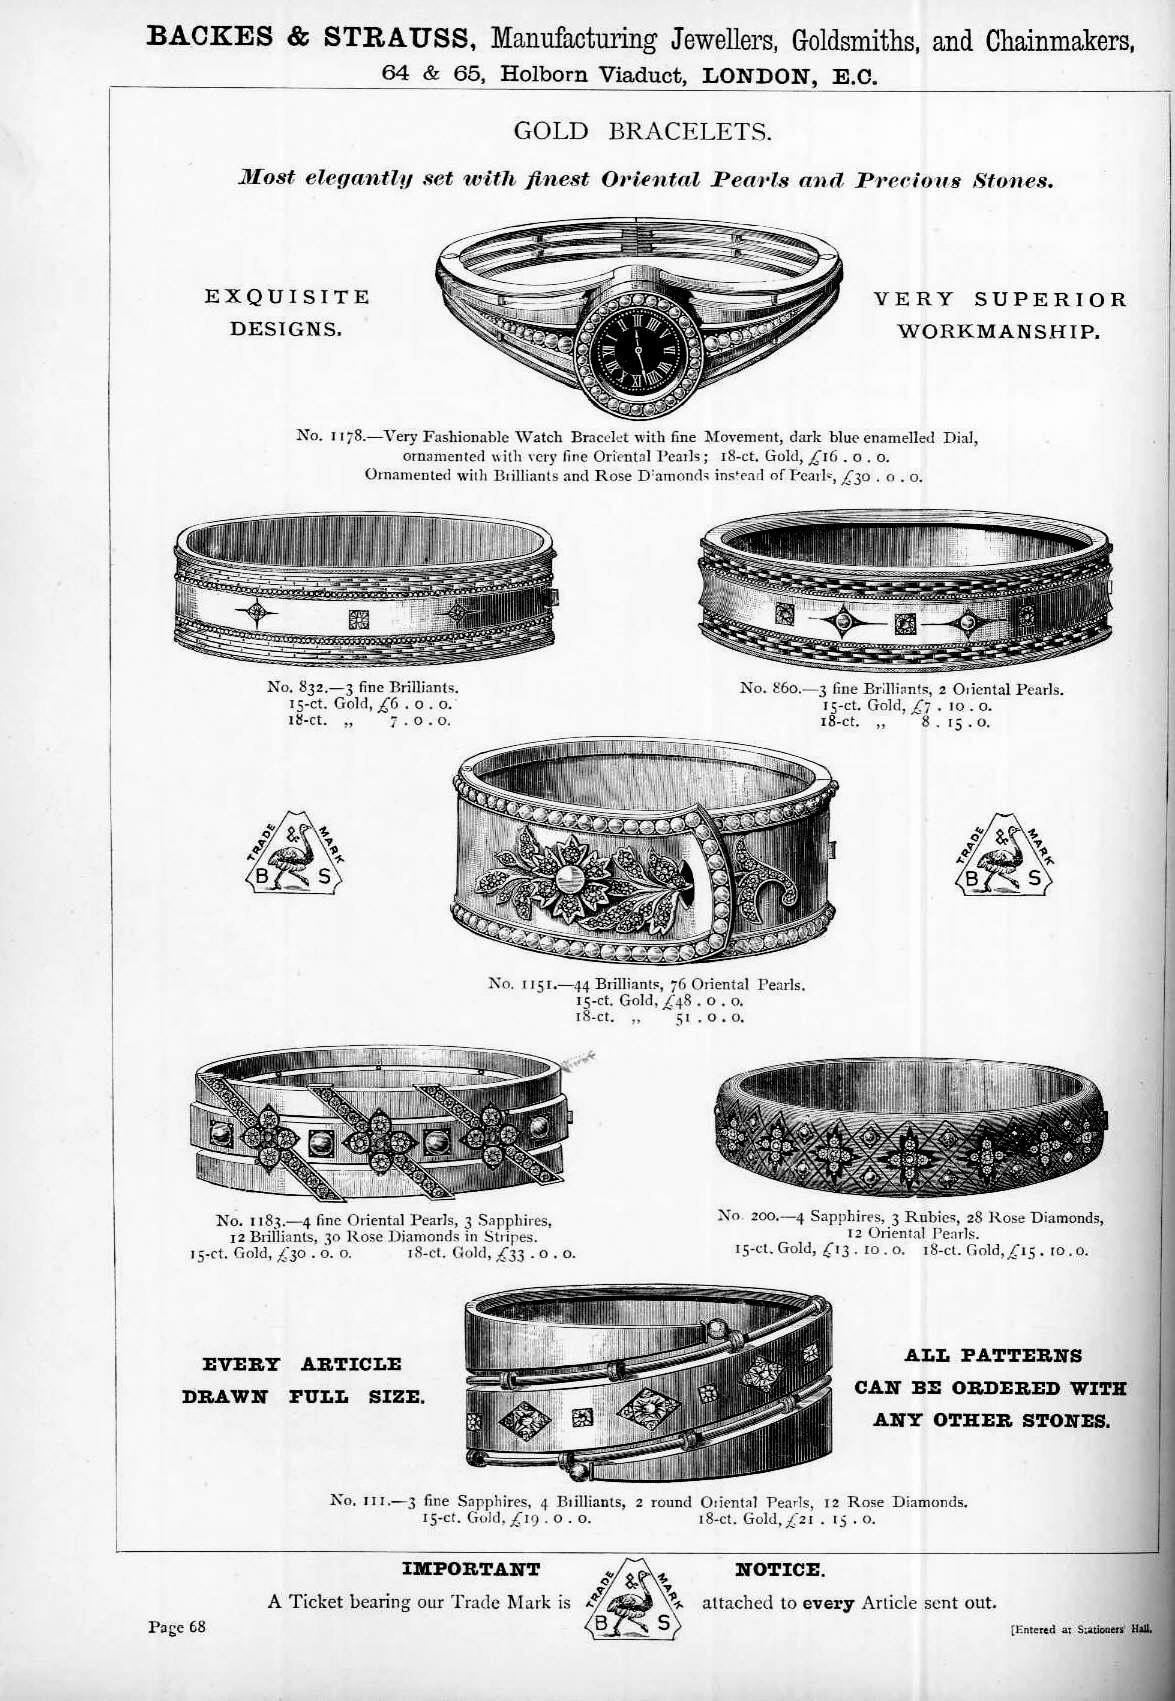 Backes & Strauss Jewellery Watch Catalogue